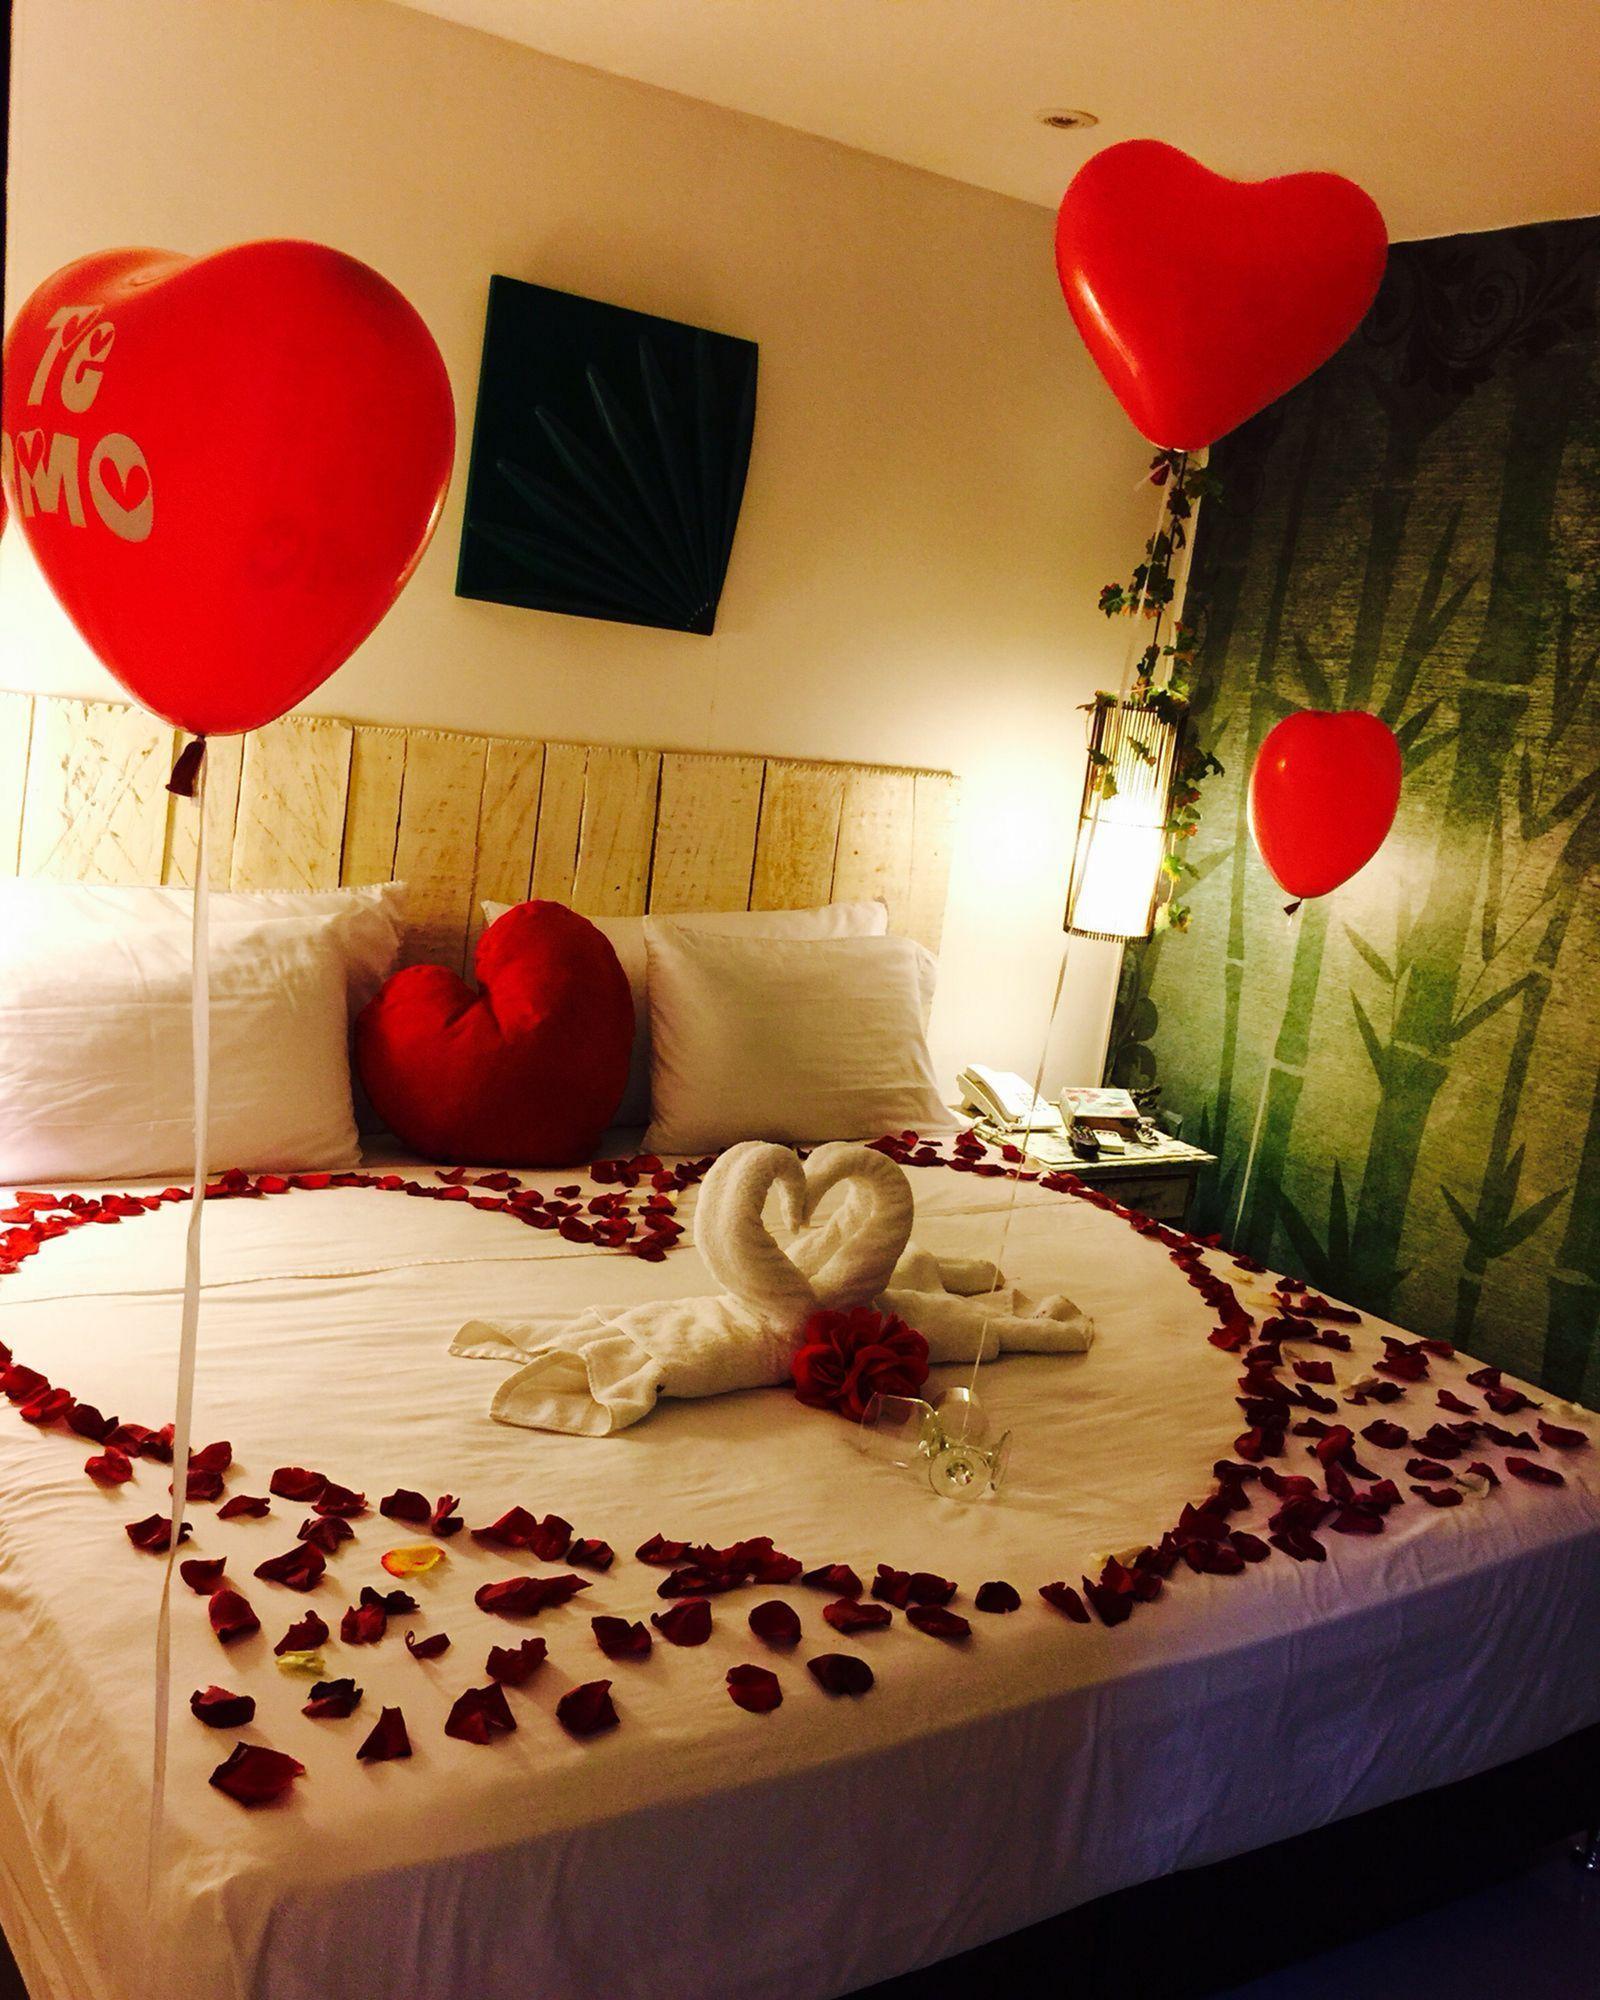 10 Special Romantic Bedroom Design Inspirations on ...